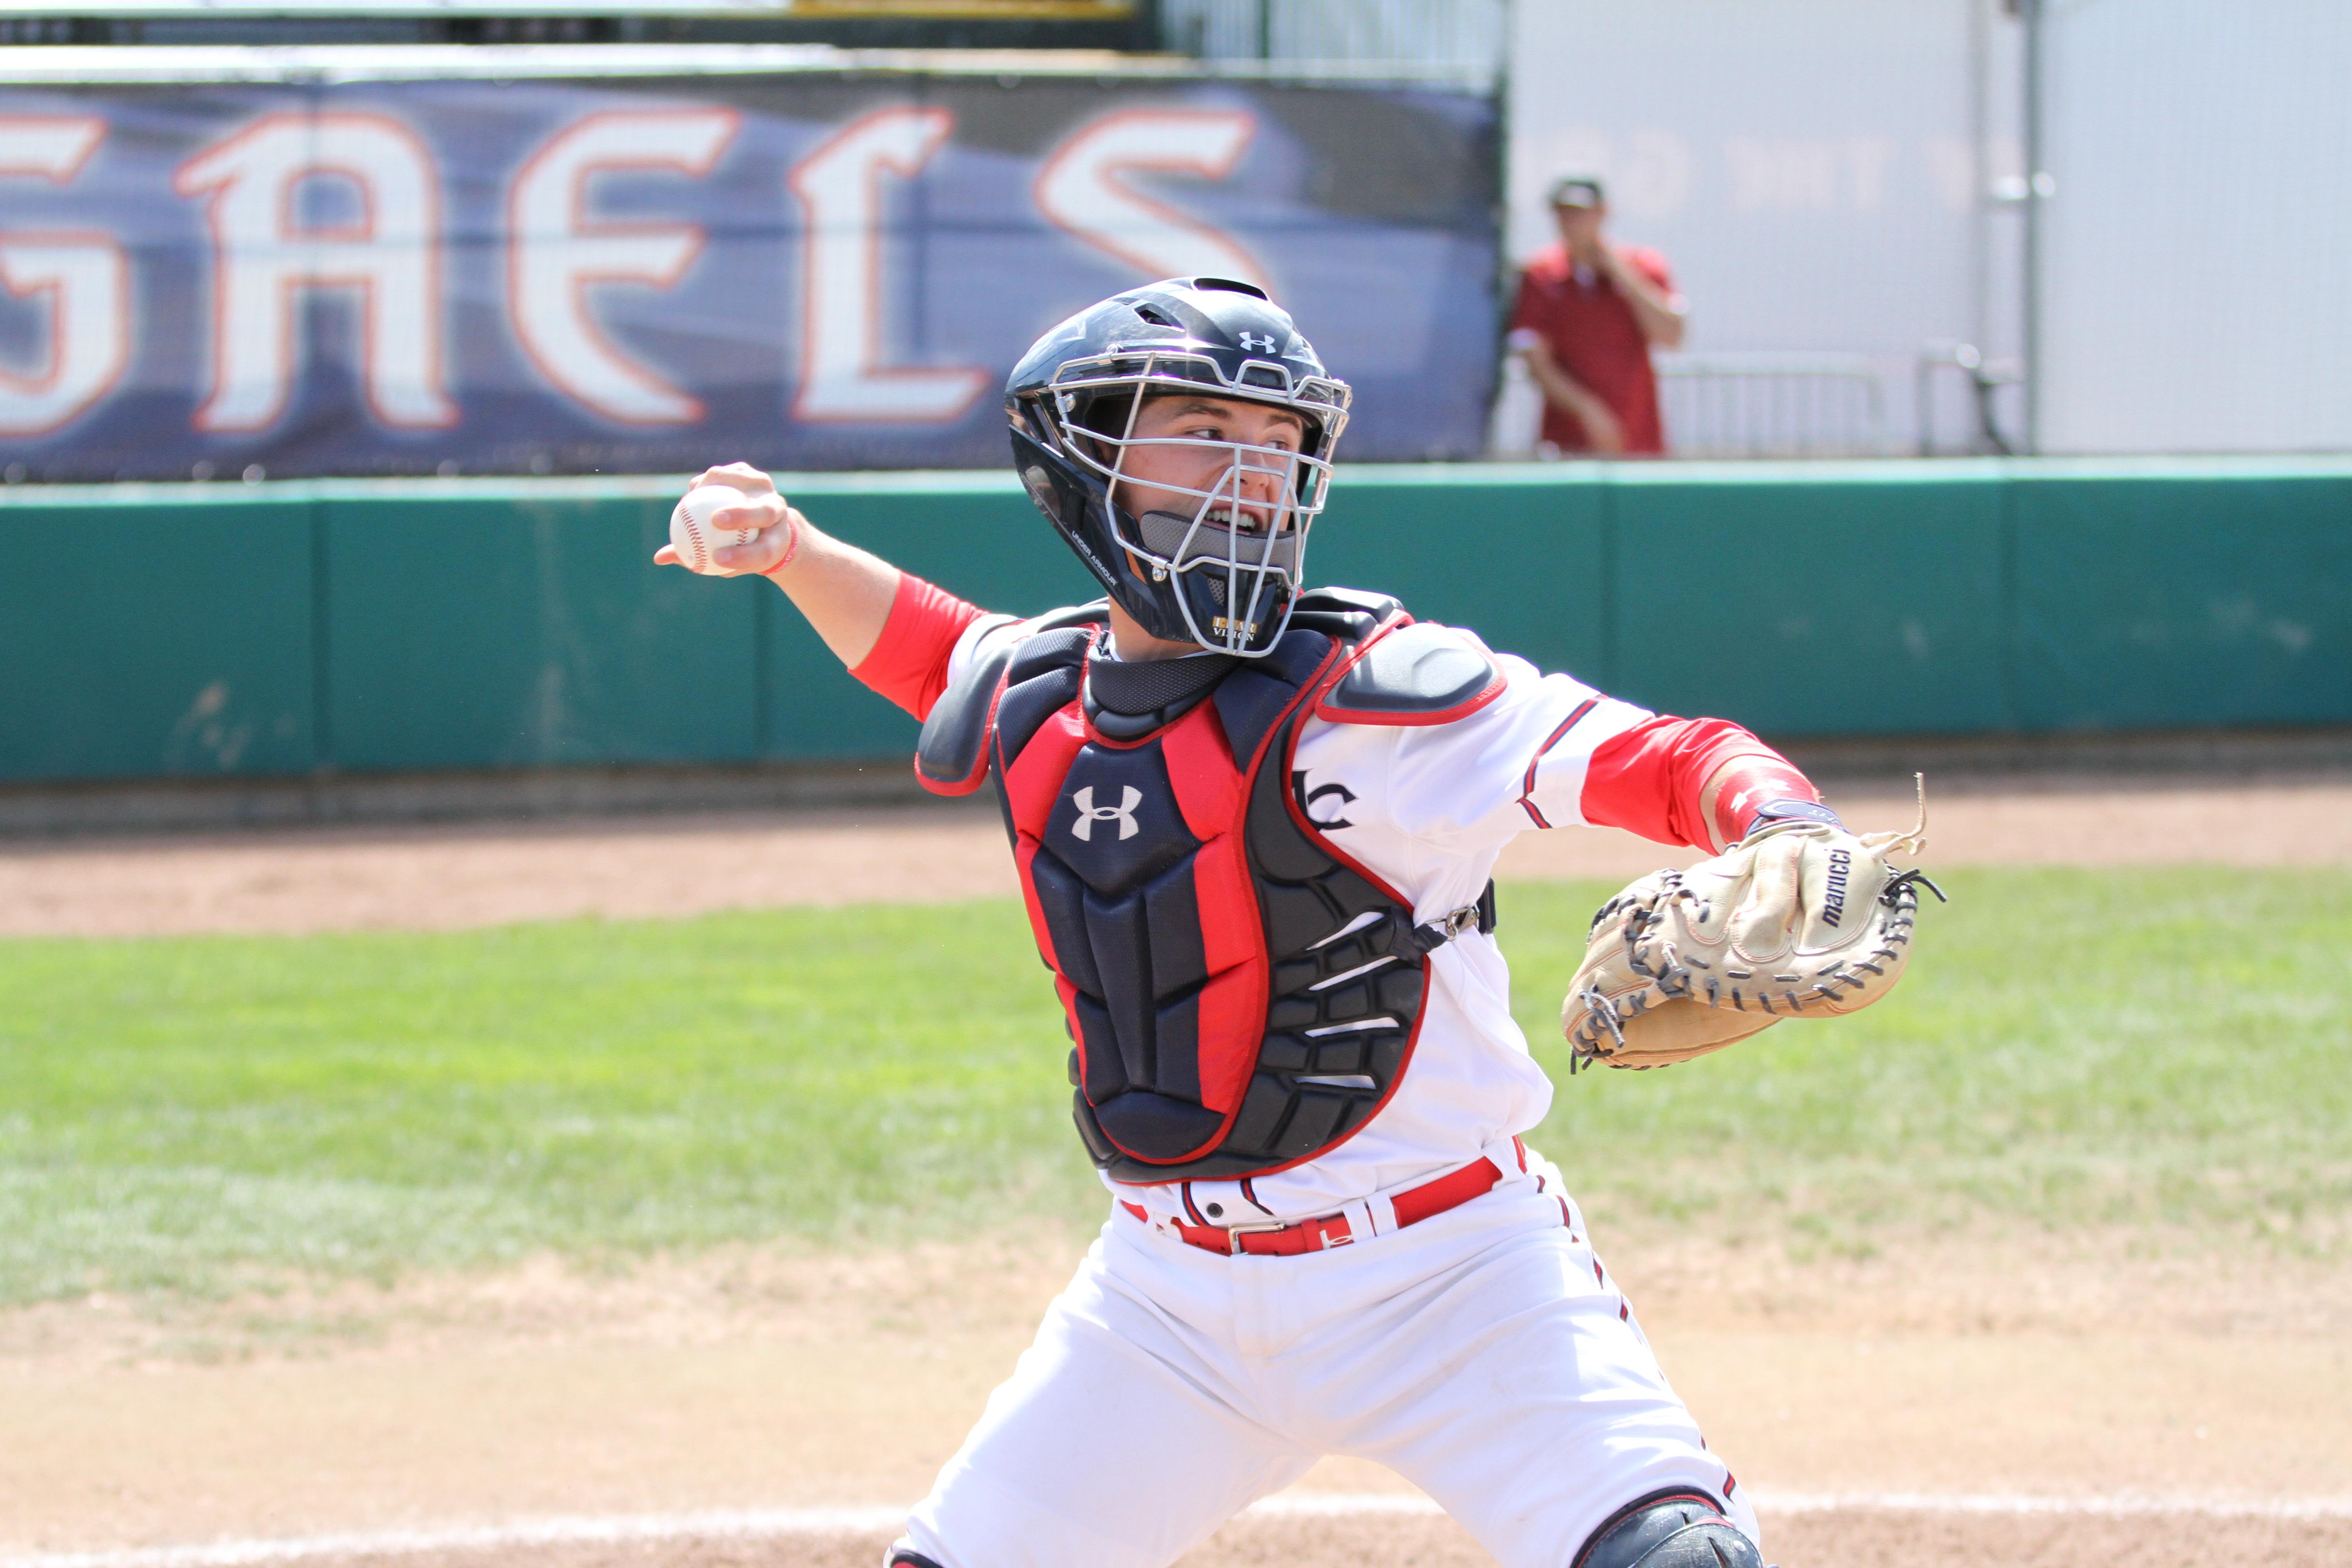 Baseball Saint Mary's Gaels vs UniversityNevada Wolfpack